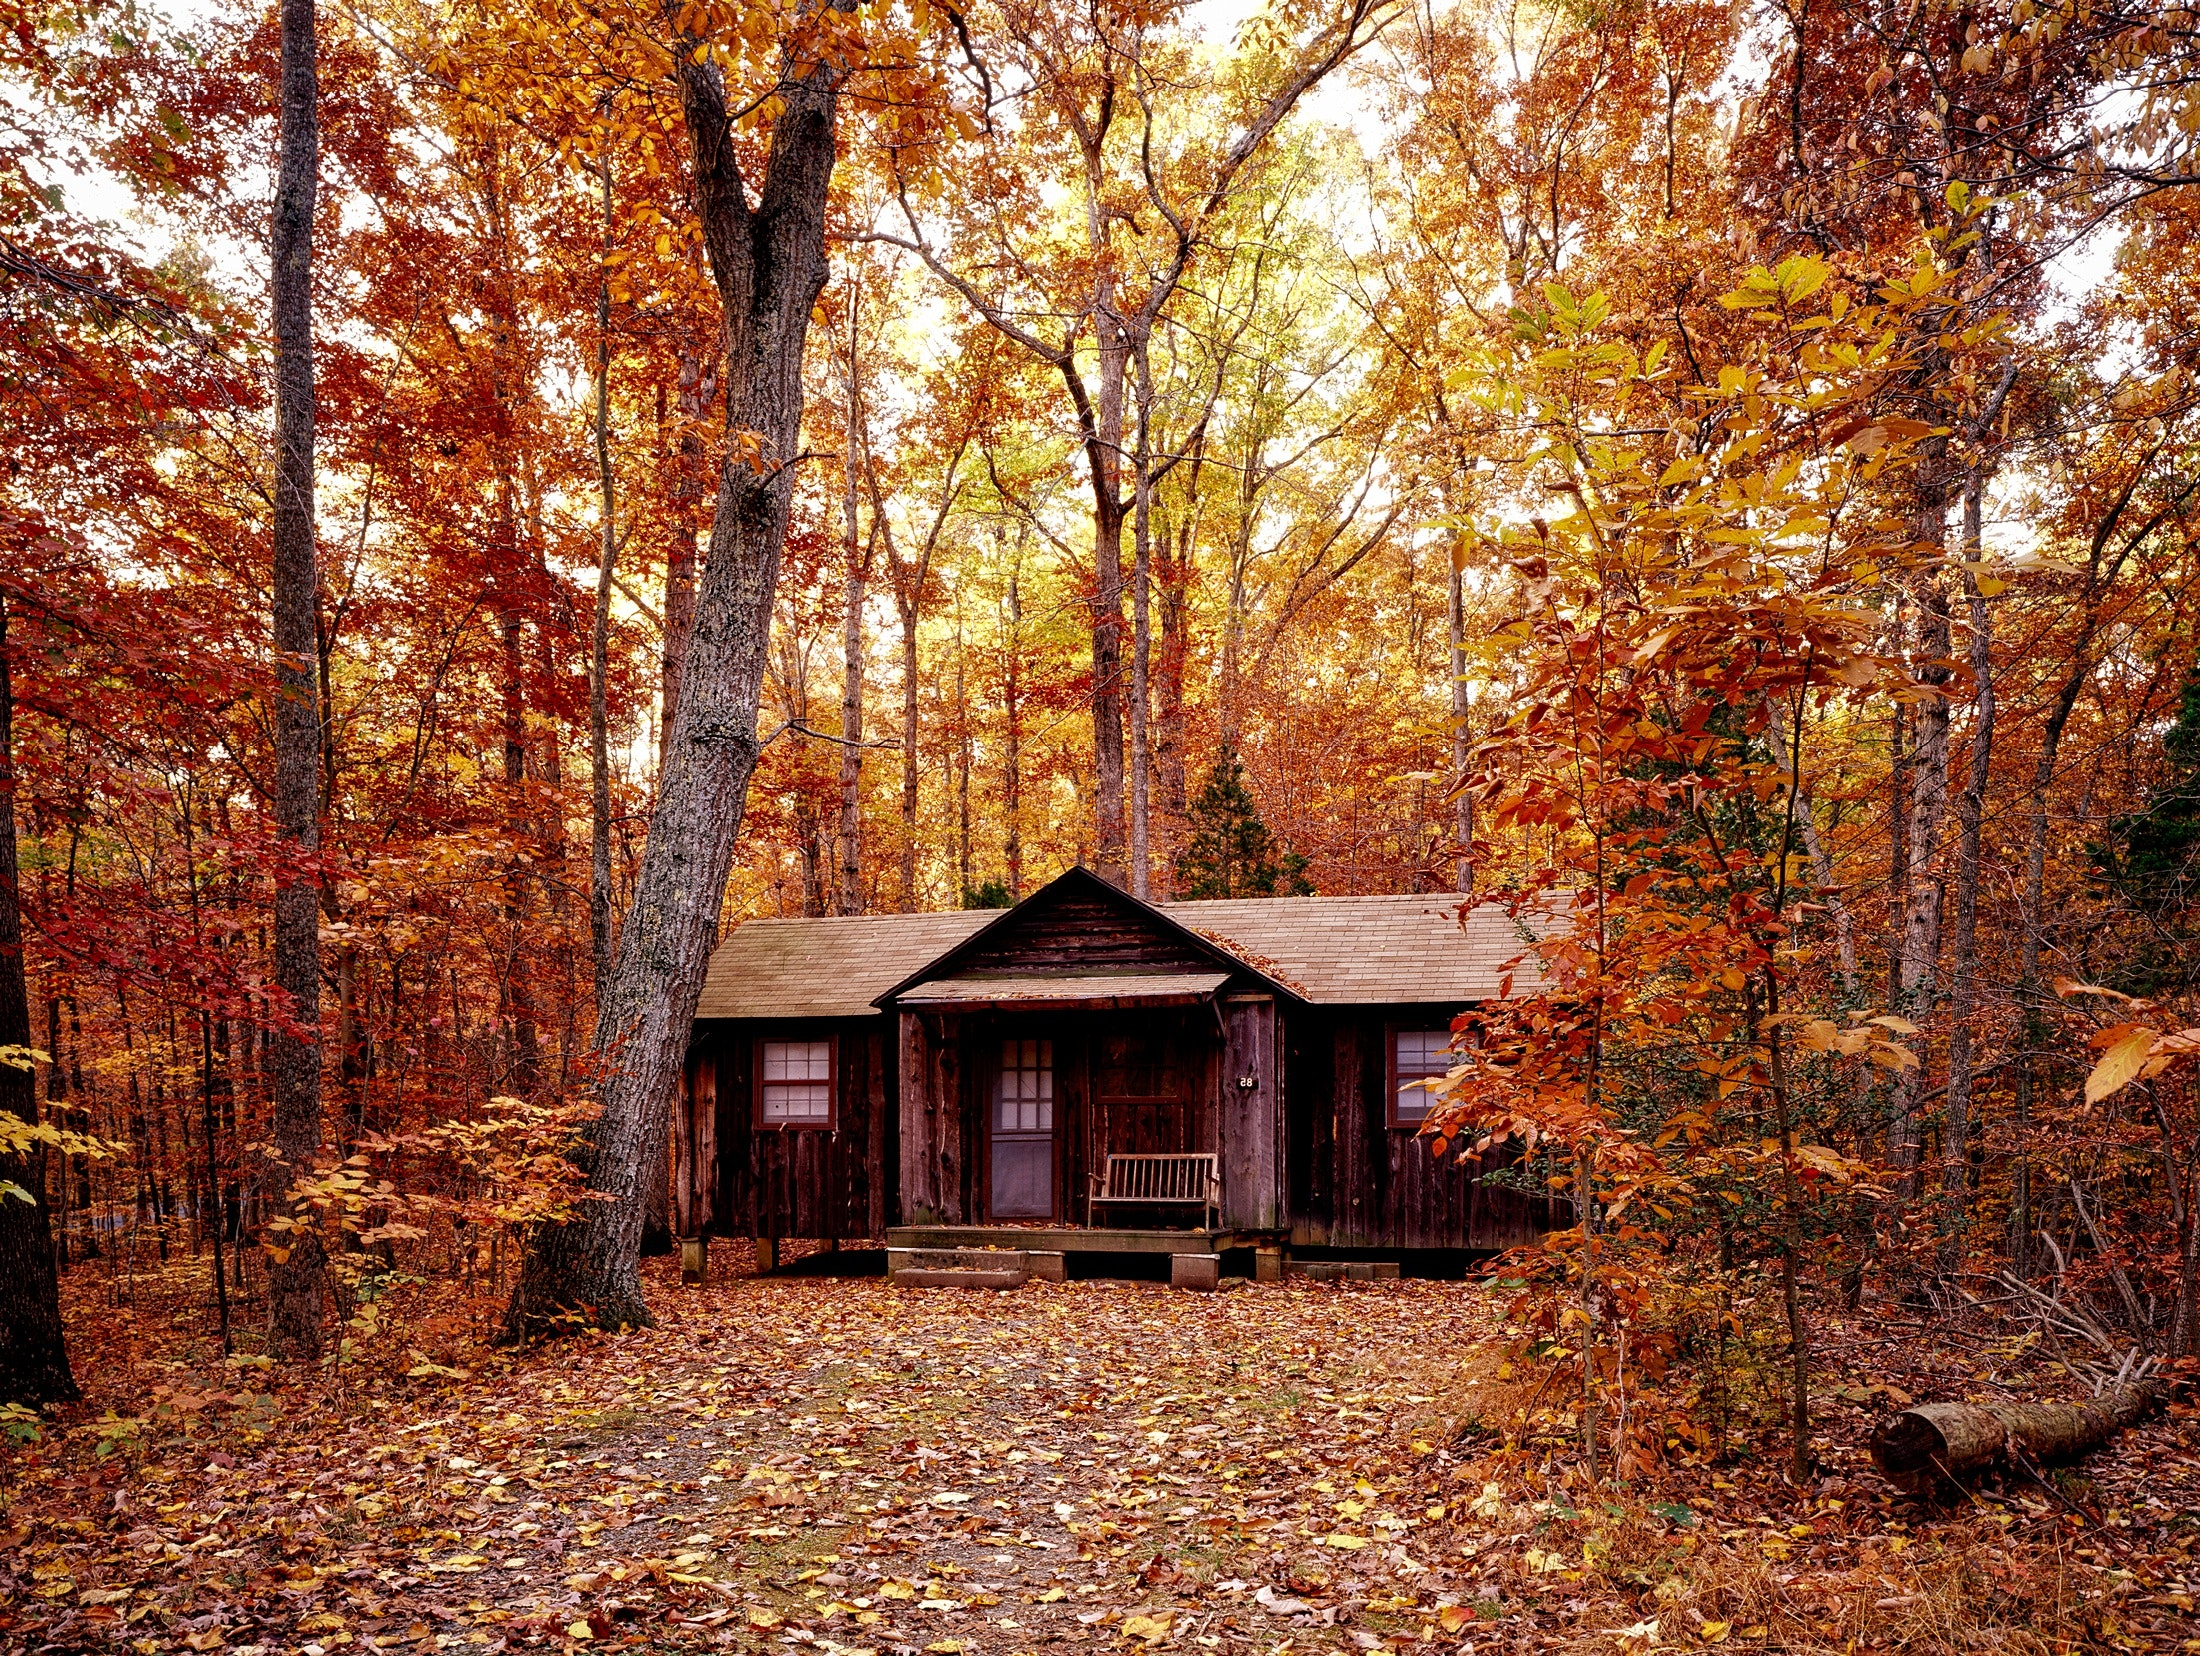 cabins for sale near locust grove virginia by sean jones